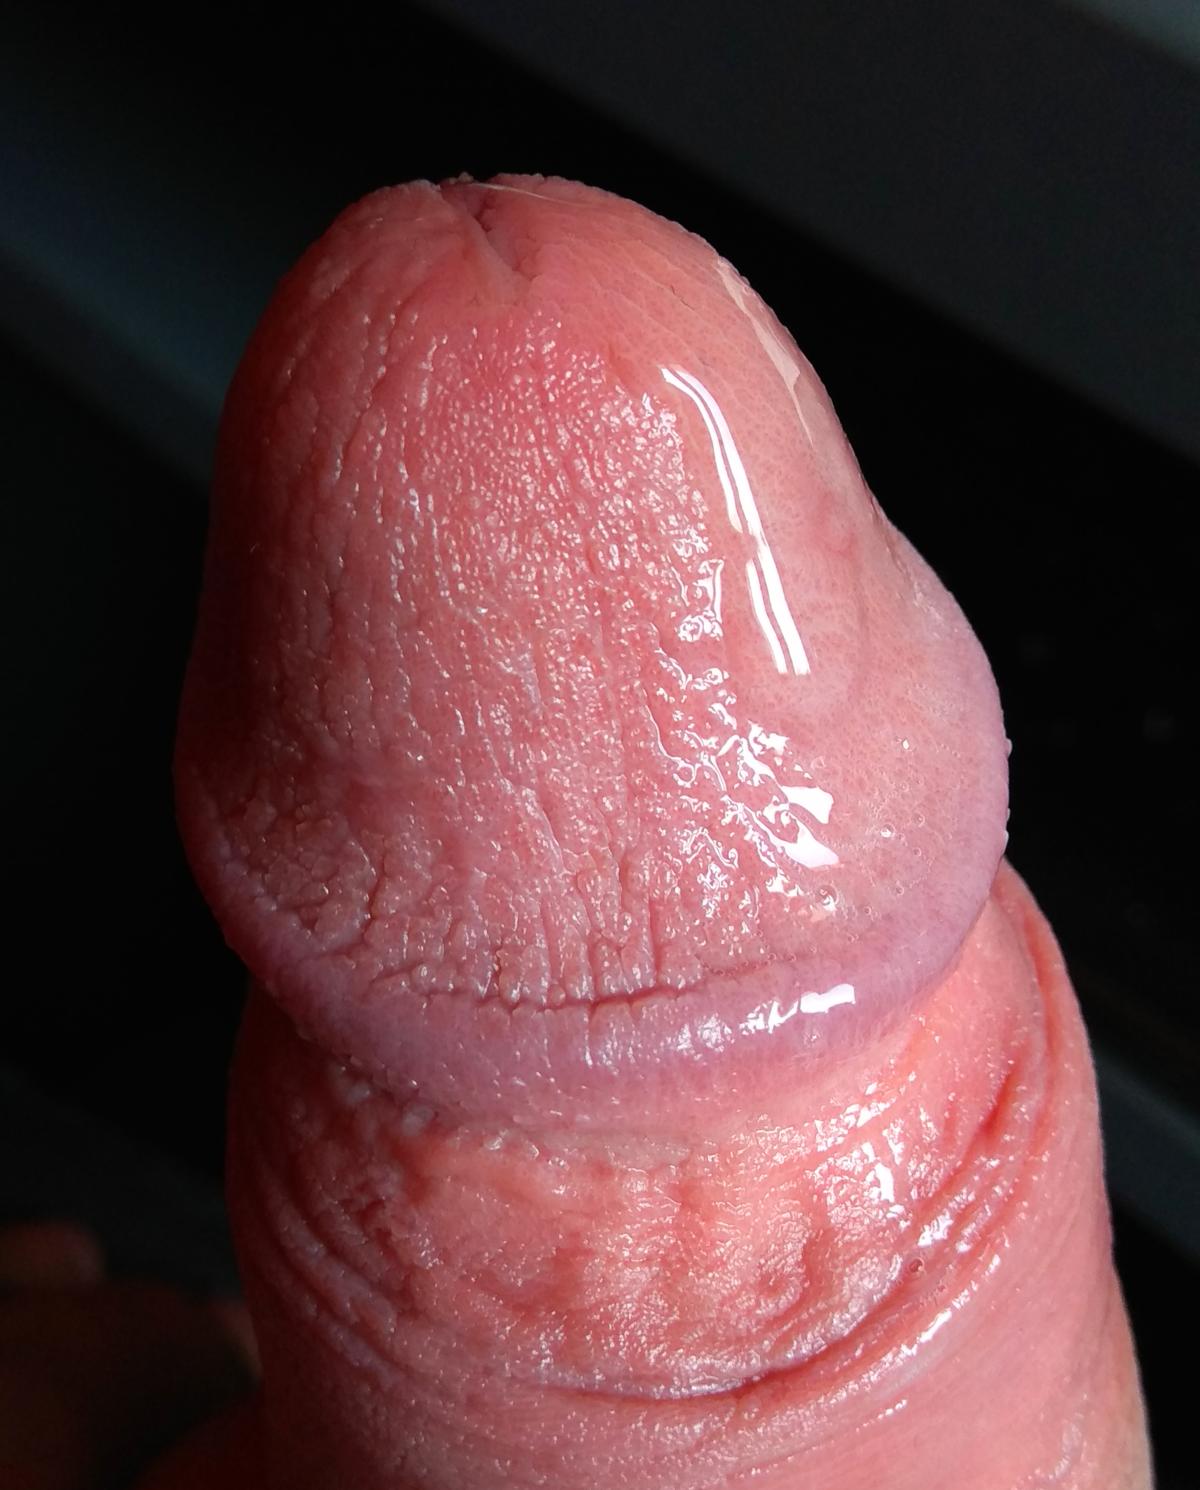 rejtett pénisz és merevedés